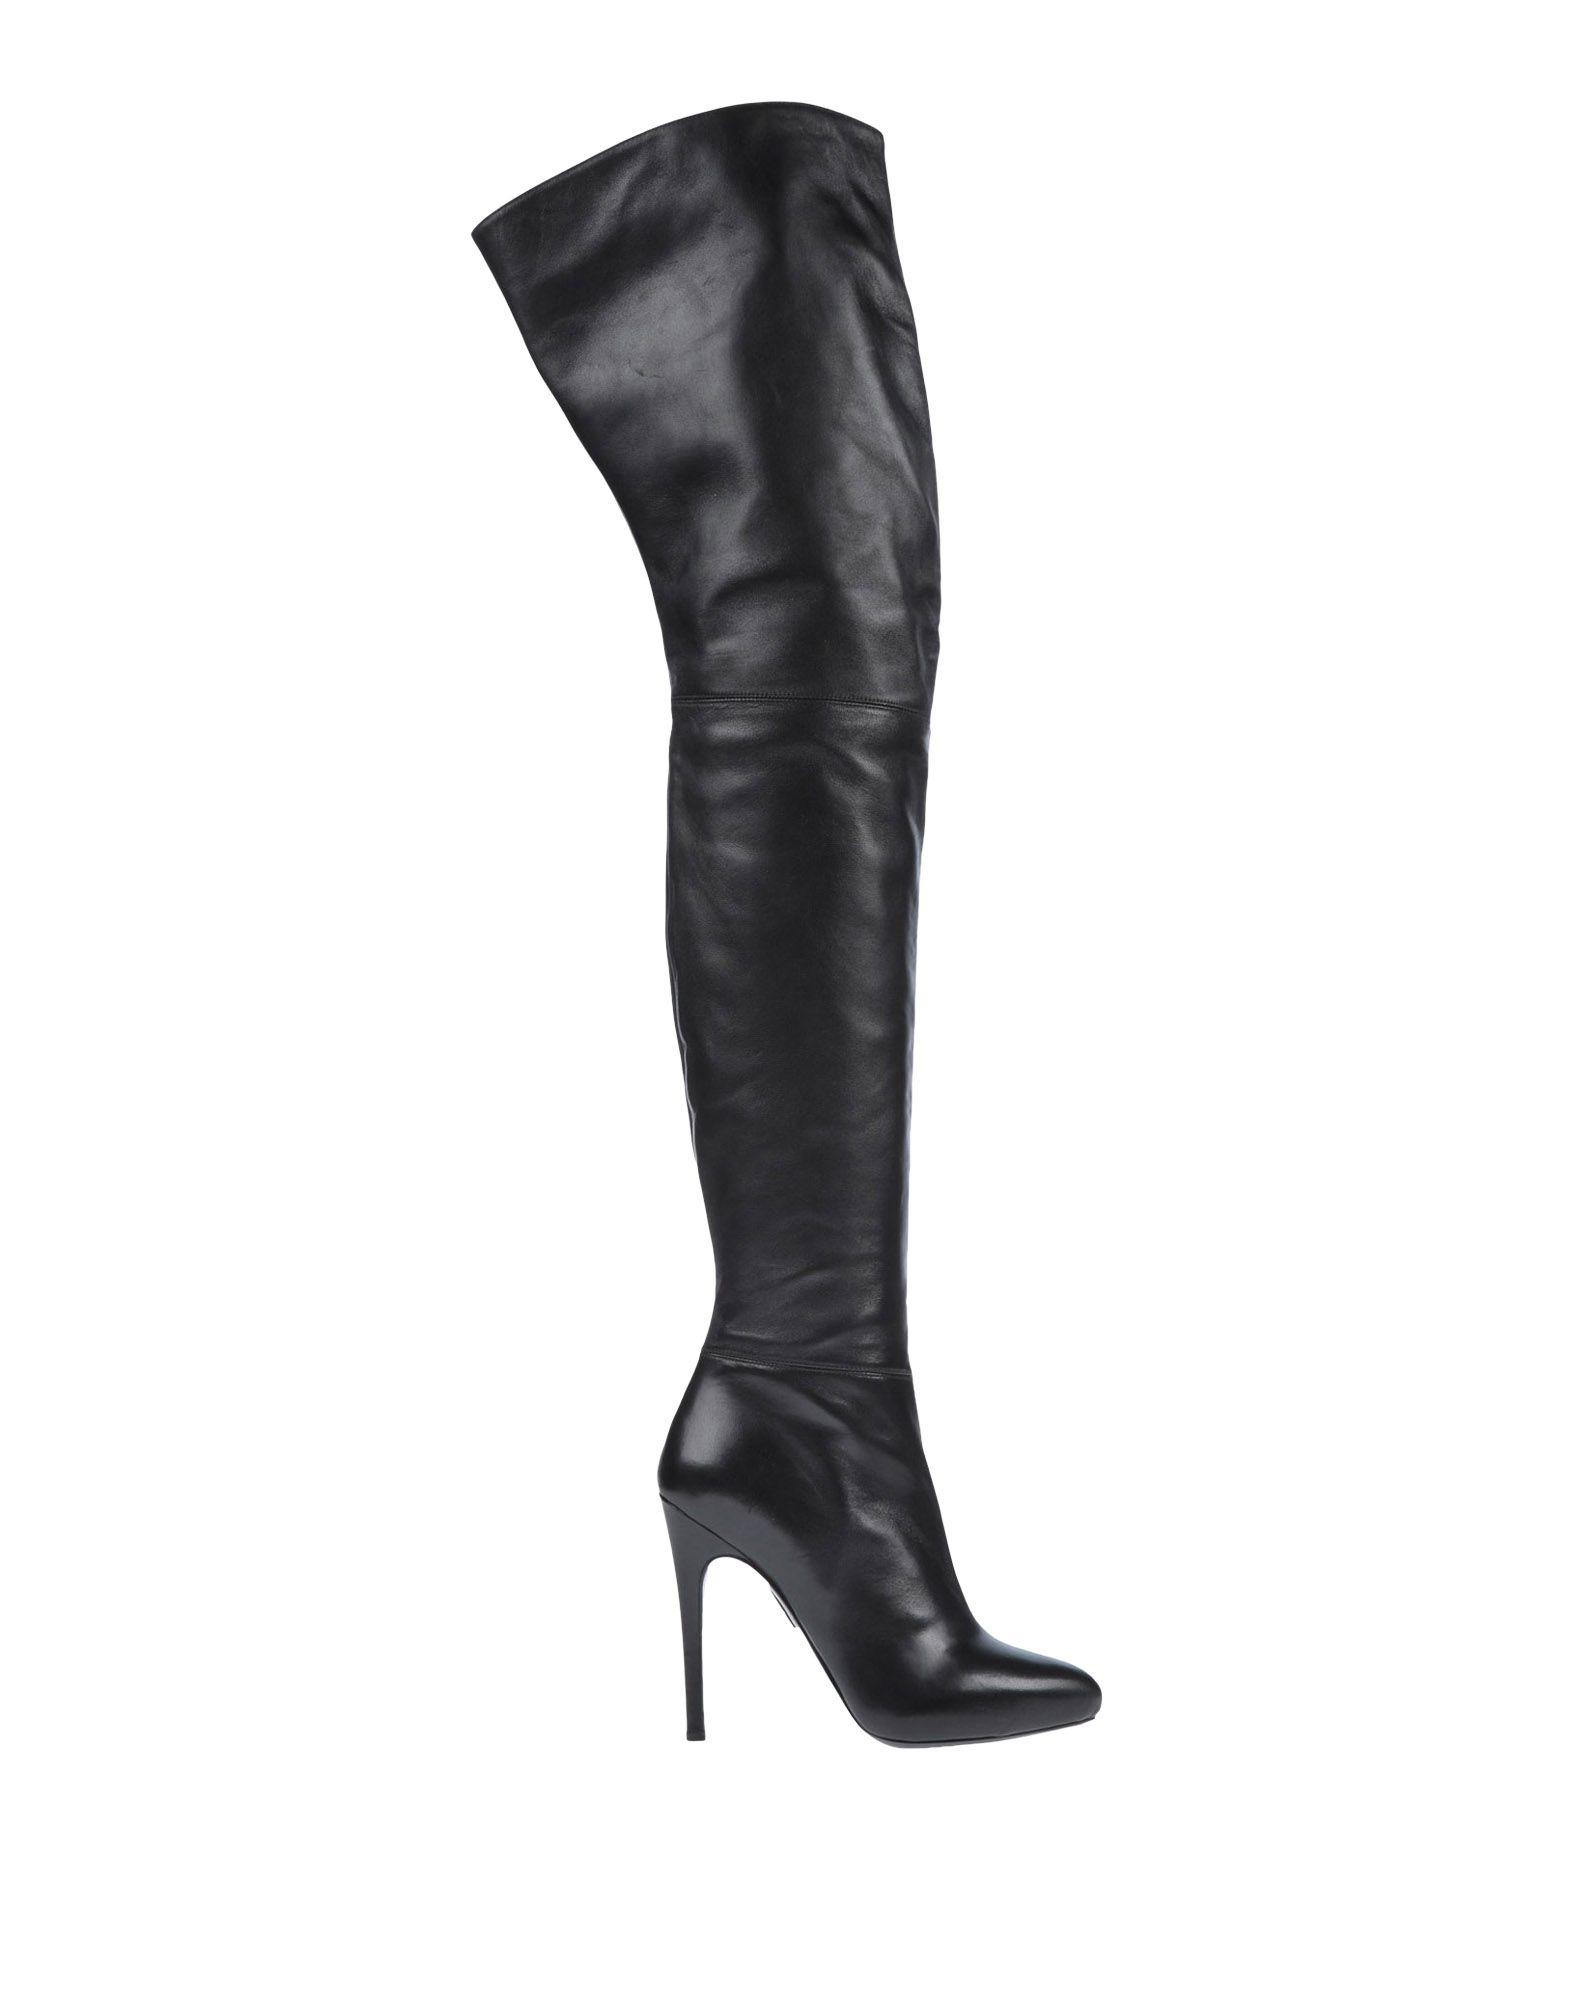 Rodolphe Menudier Stiefel Stiefel Stiefel Damen  11516828FJ Beliebte Schuhe 9e9273